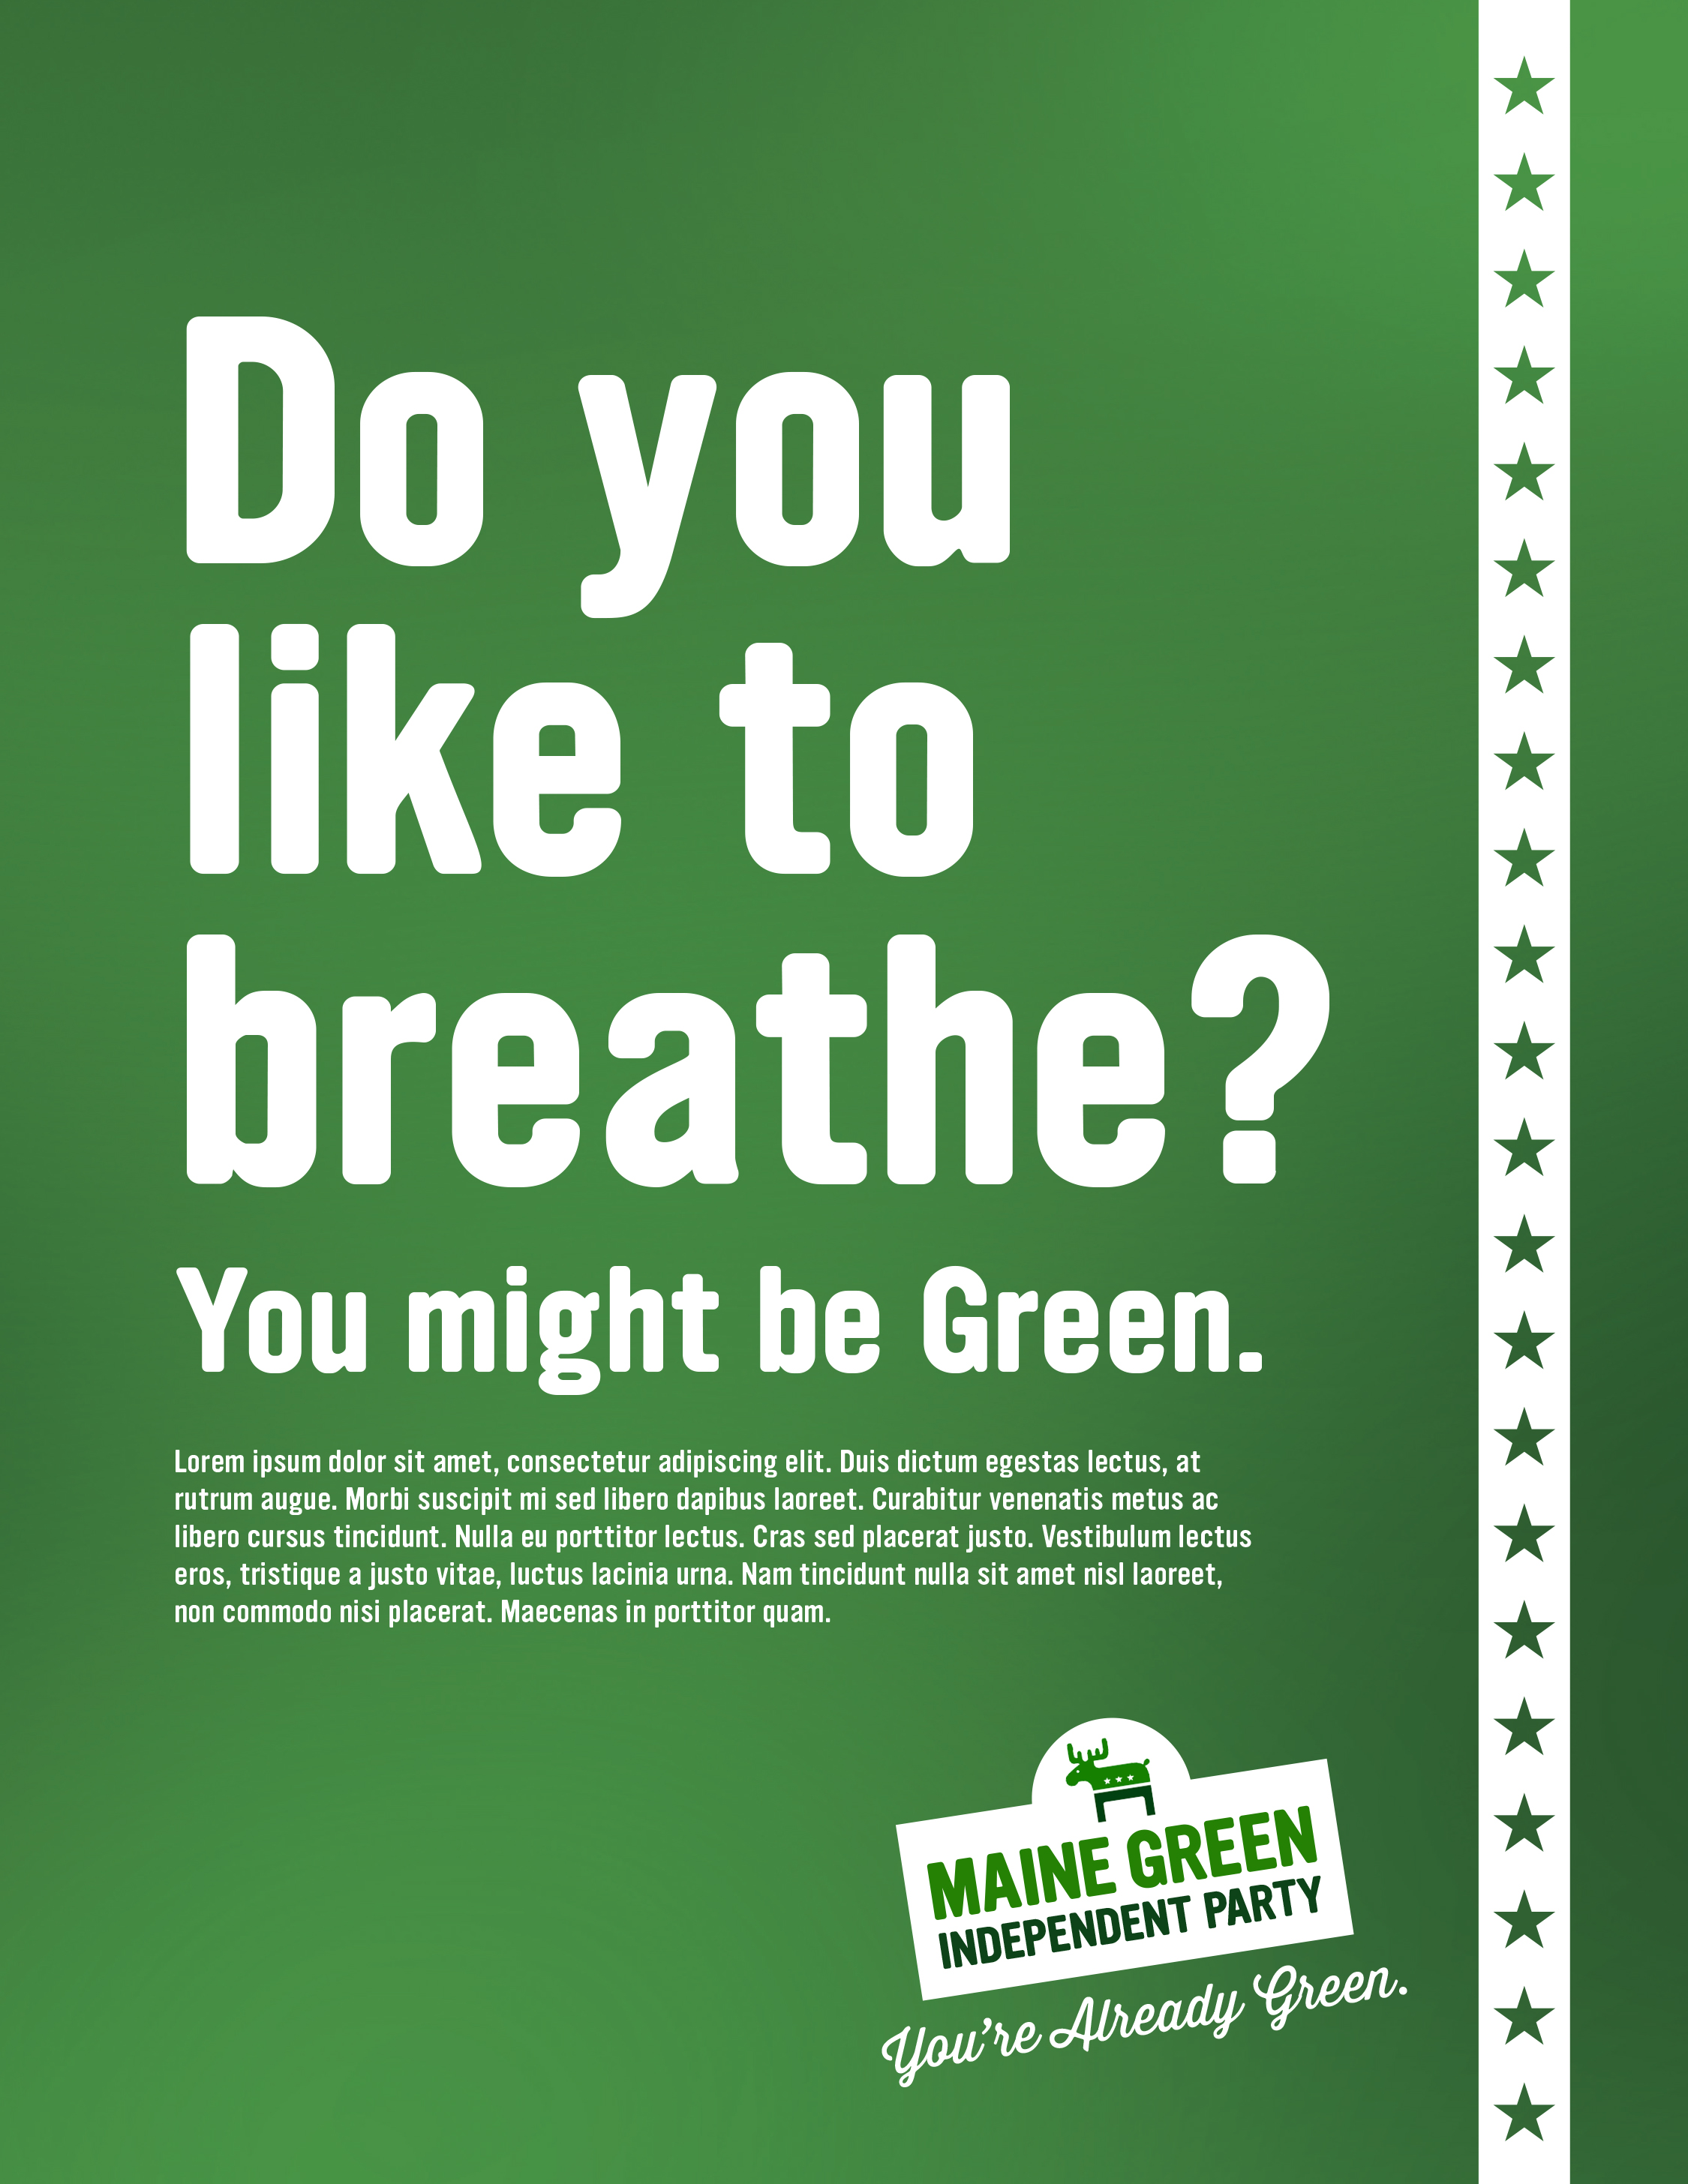 Might be Green_breathe.jpg